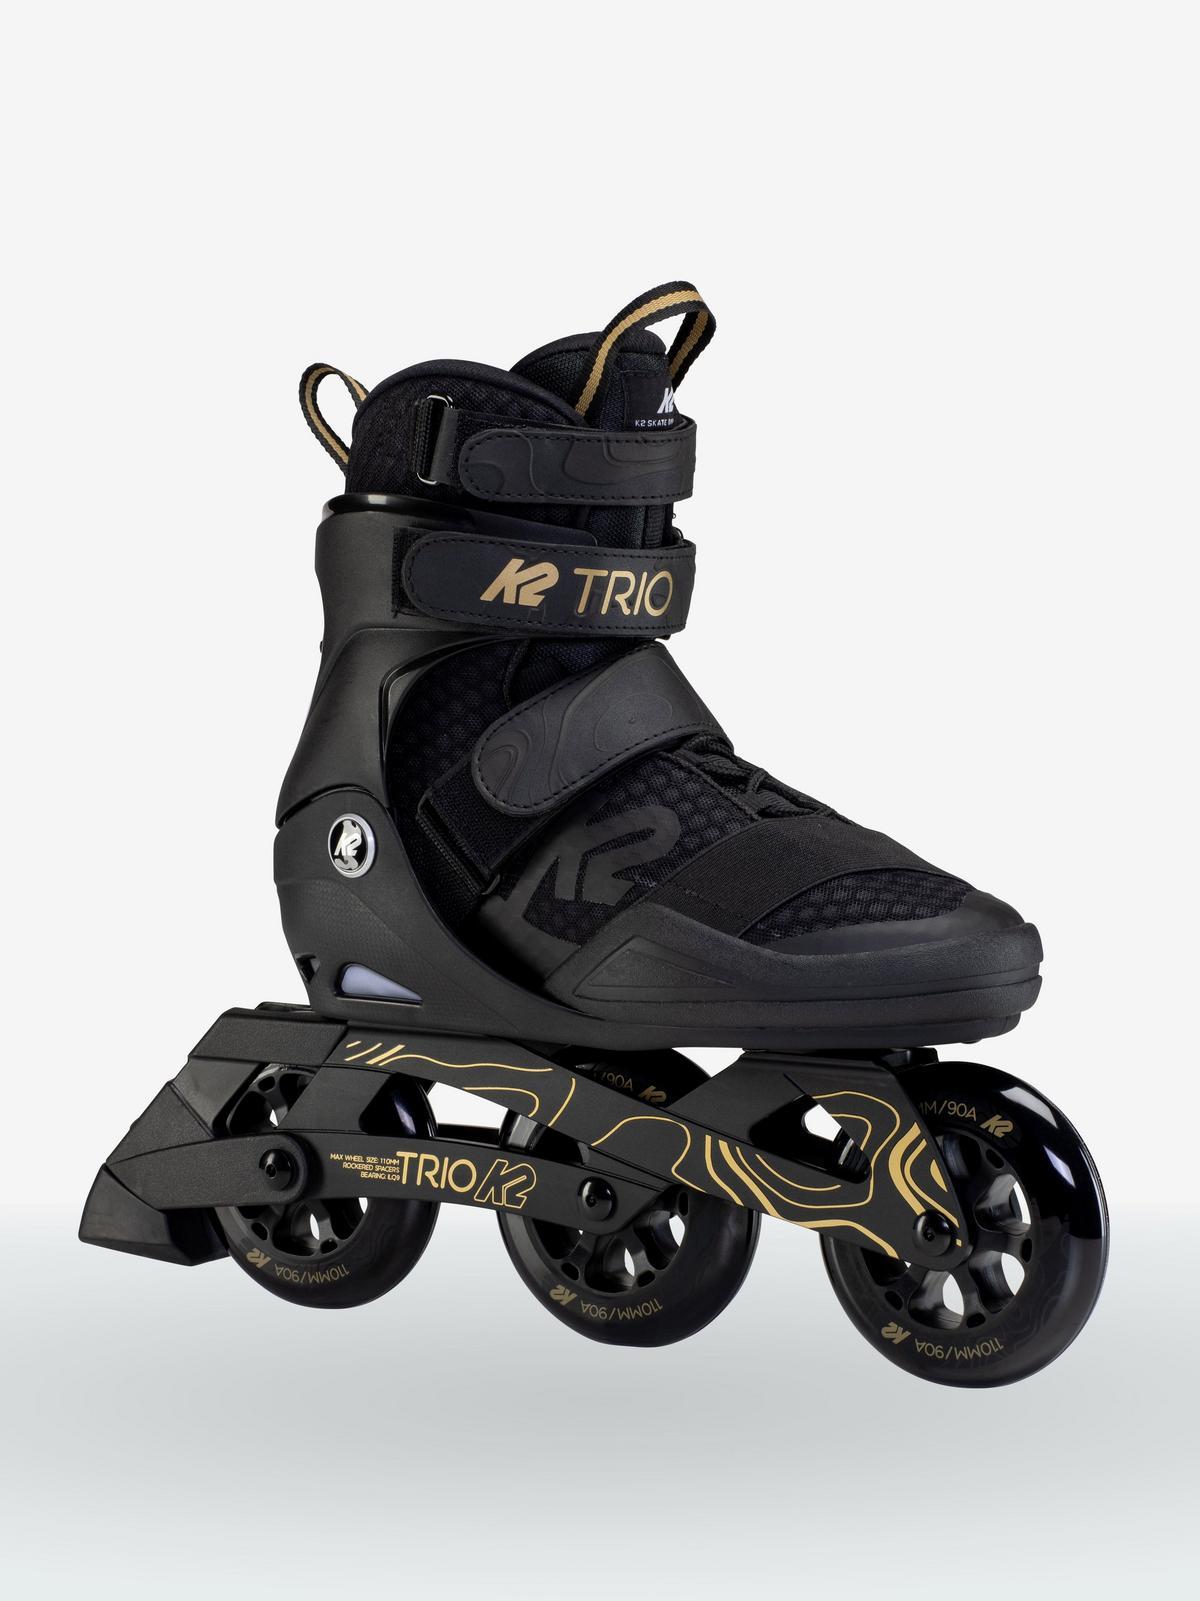 K2 Trio 110 M Inline Skates